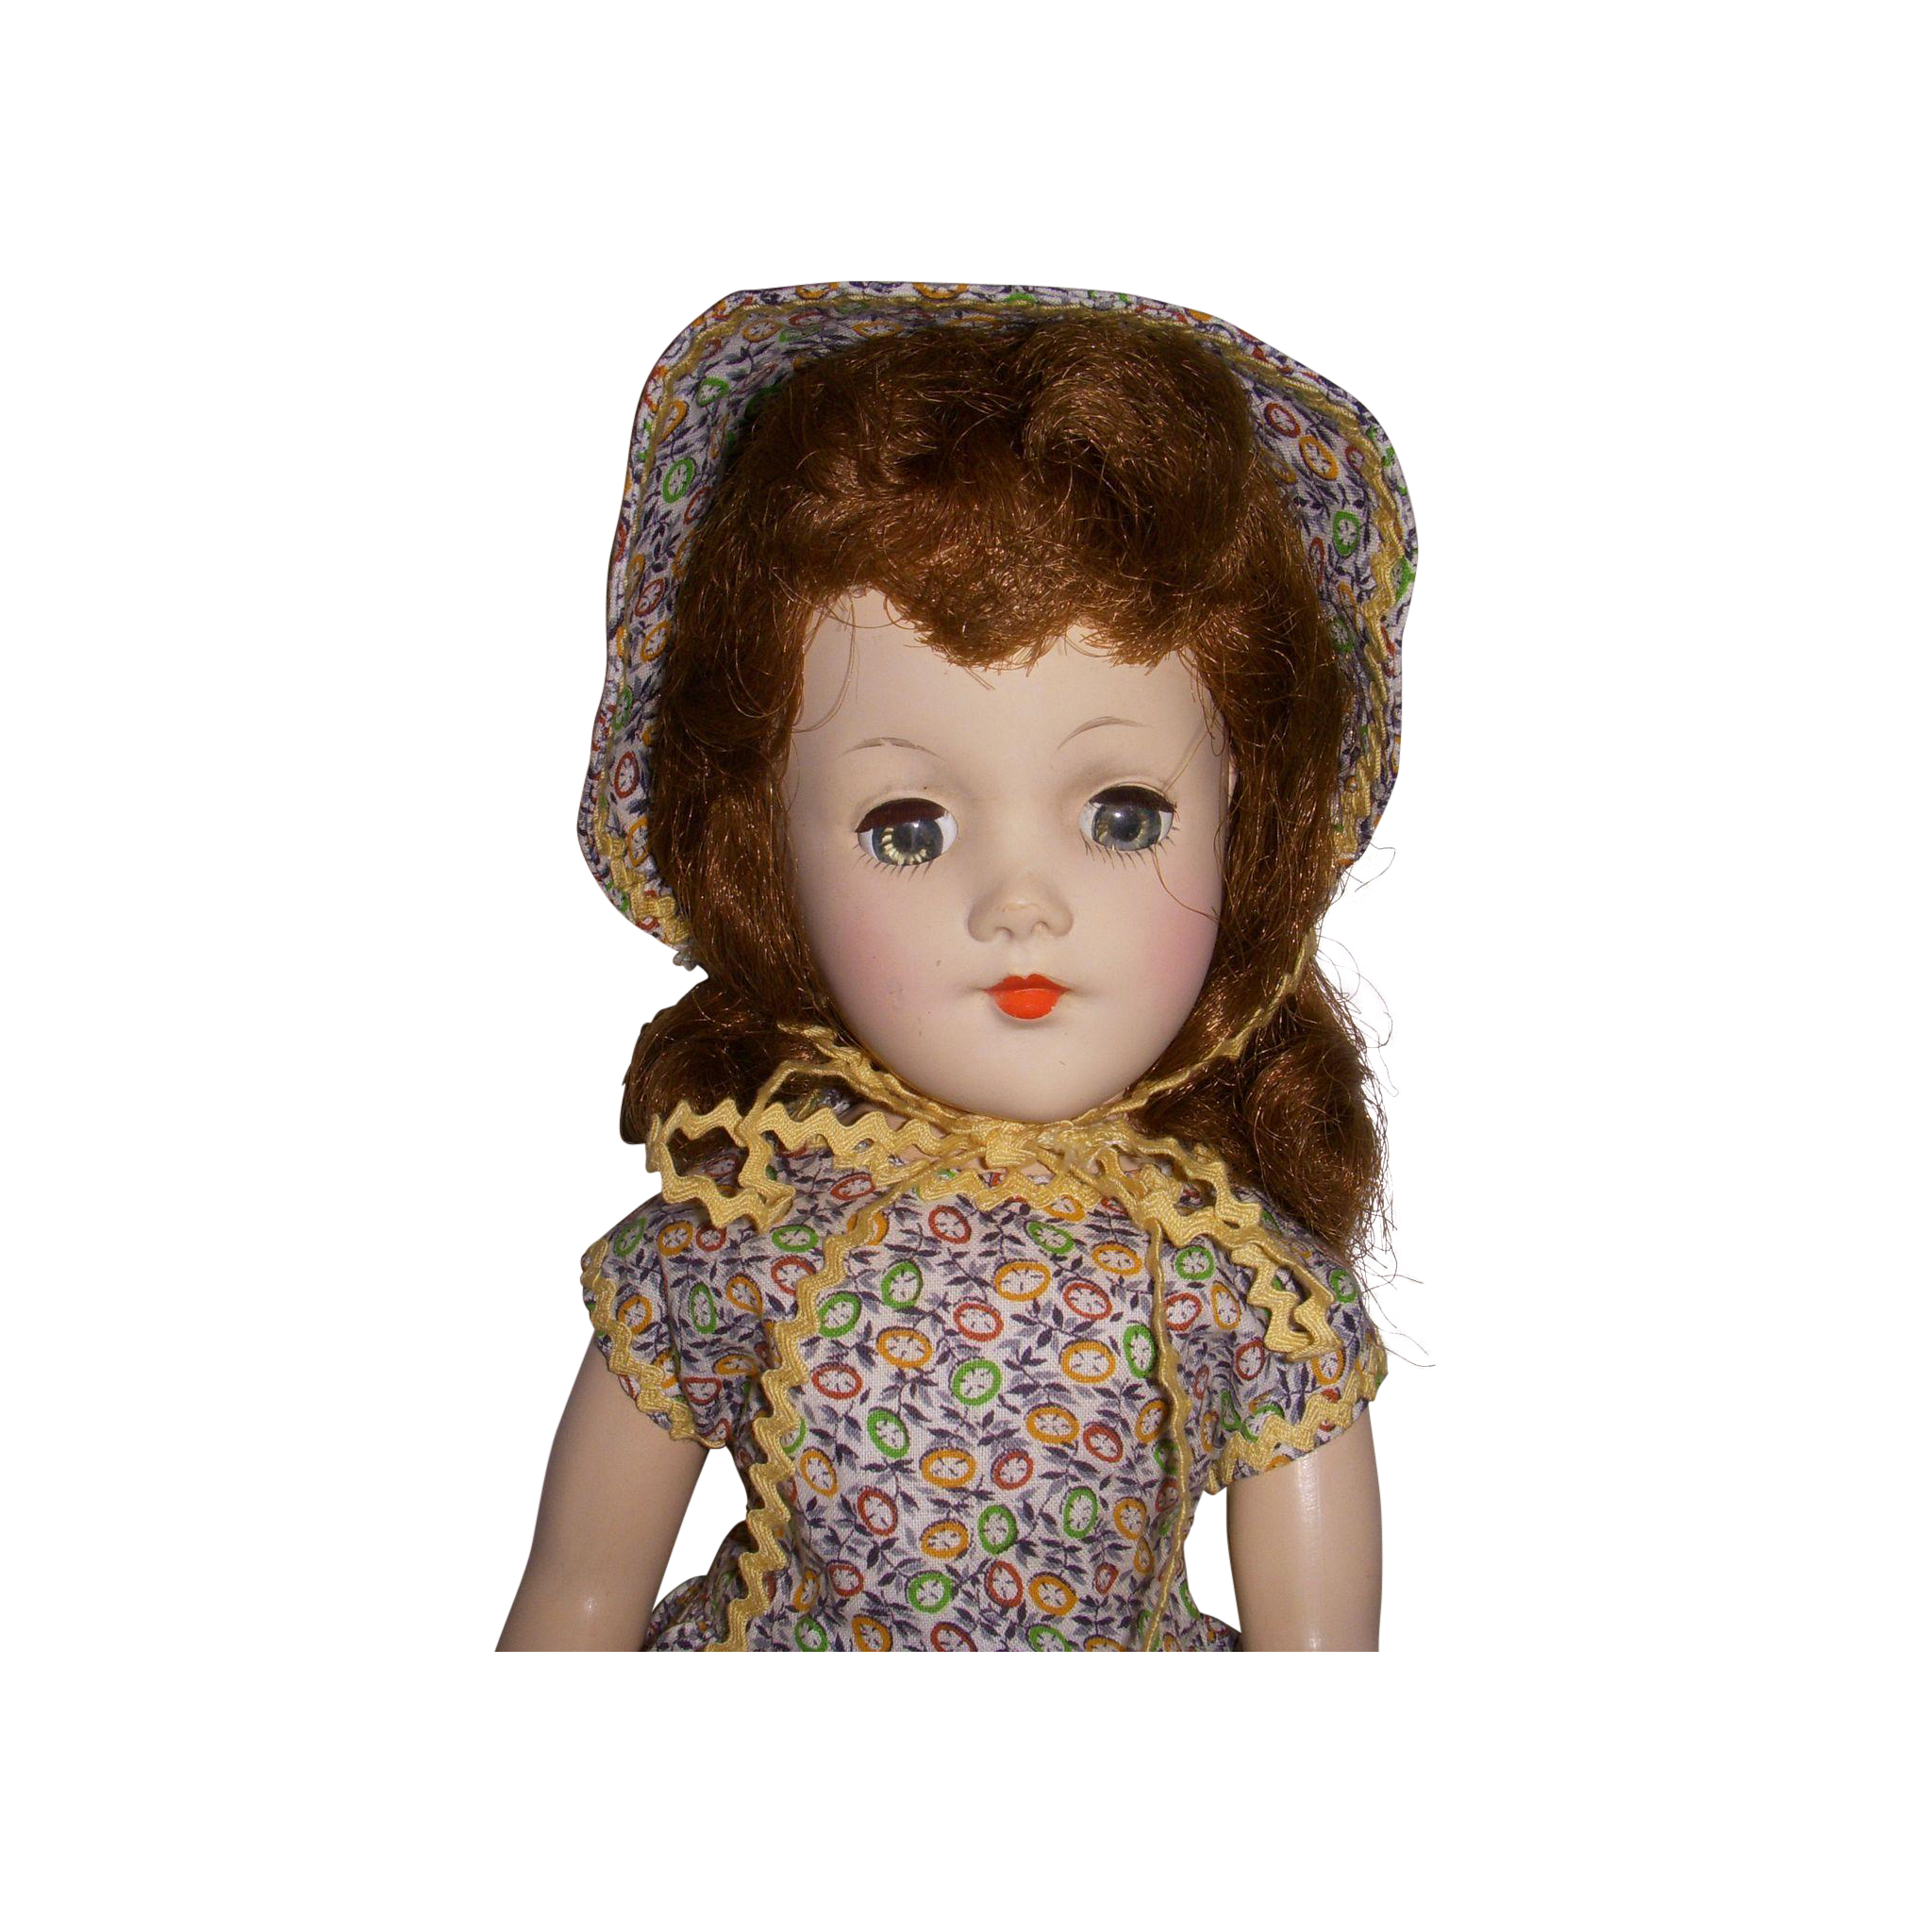 Vintage 1950s All Original Mary Hoyer Doll